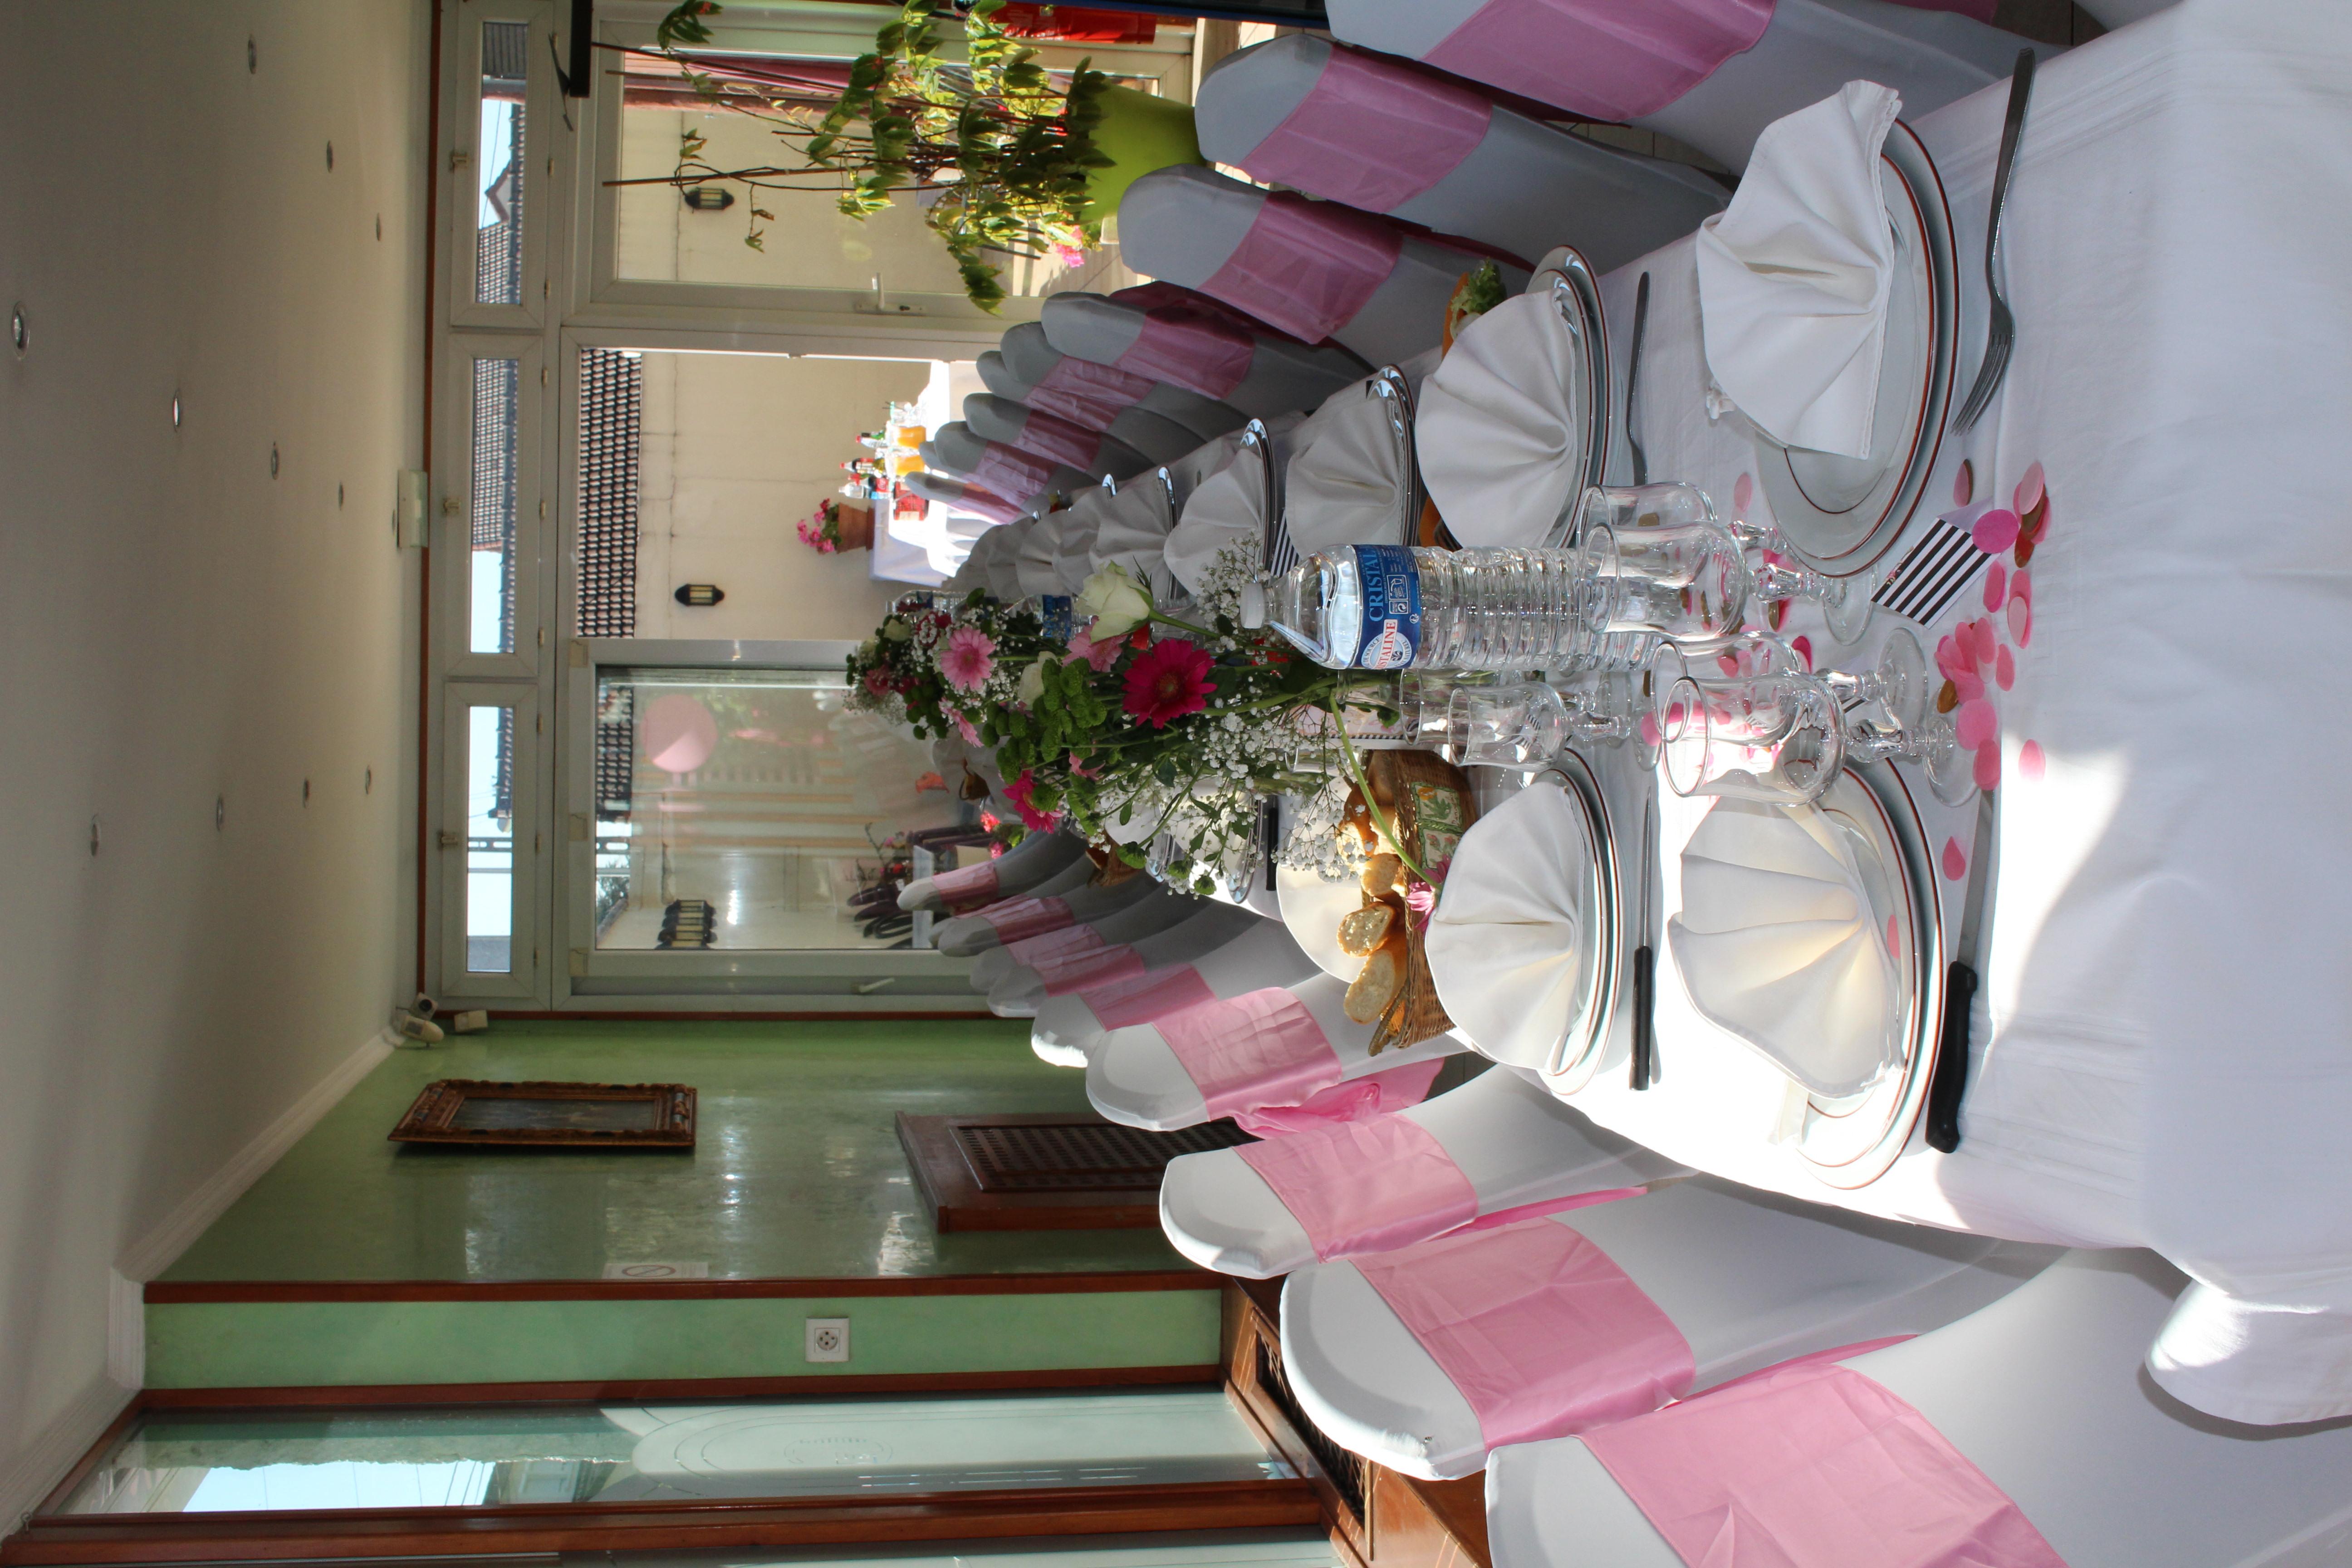 Bapt me flamingo de charlie organisation baby shower anniversaire enfants - Decoration flamant rose ...